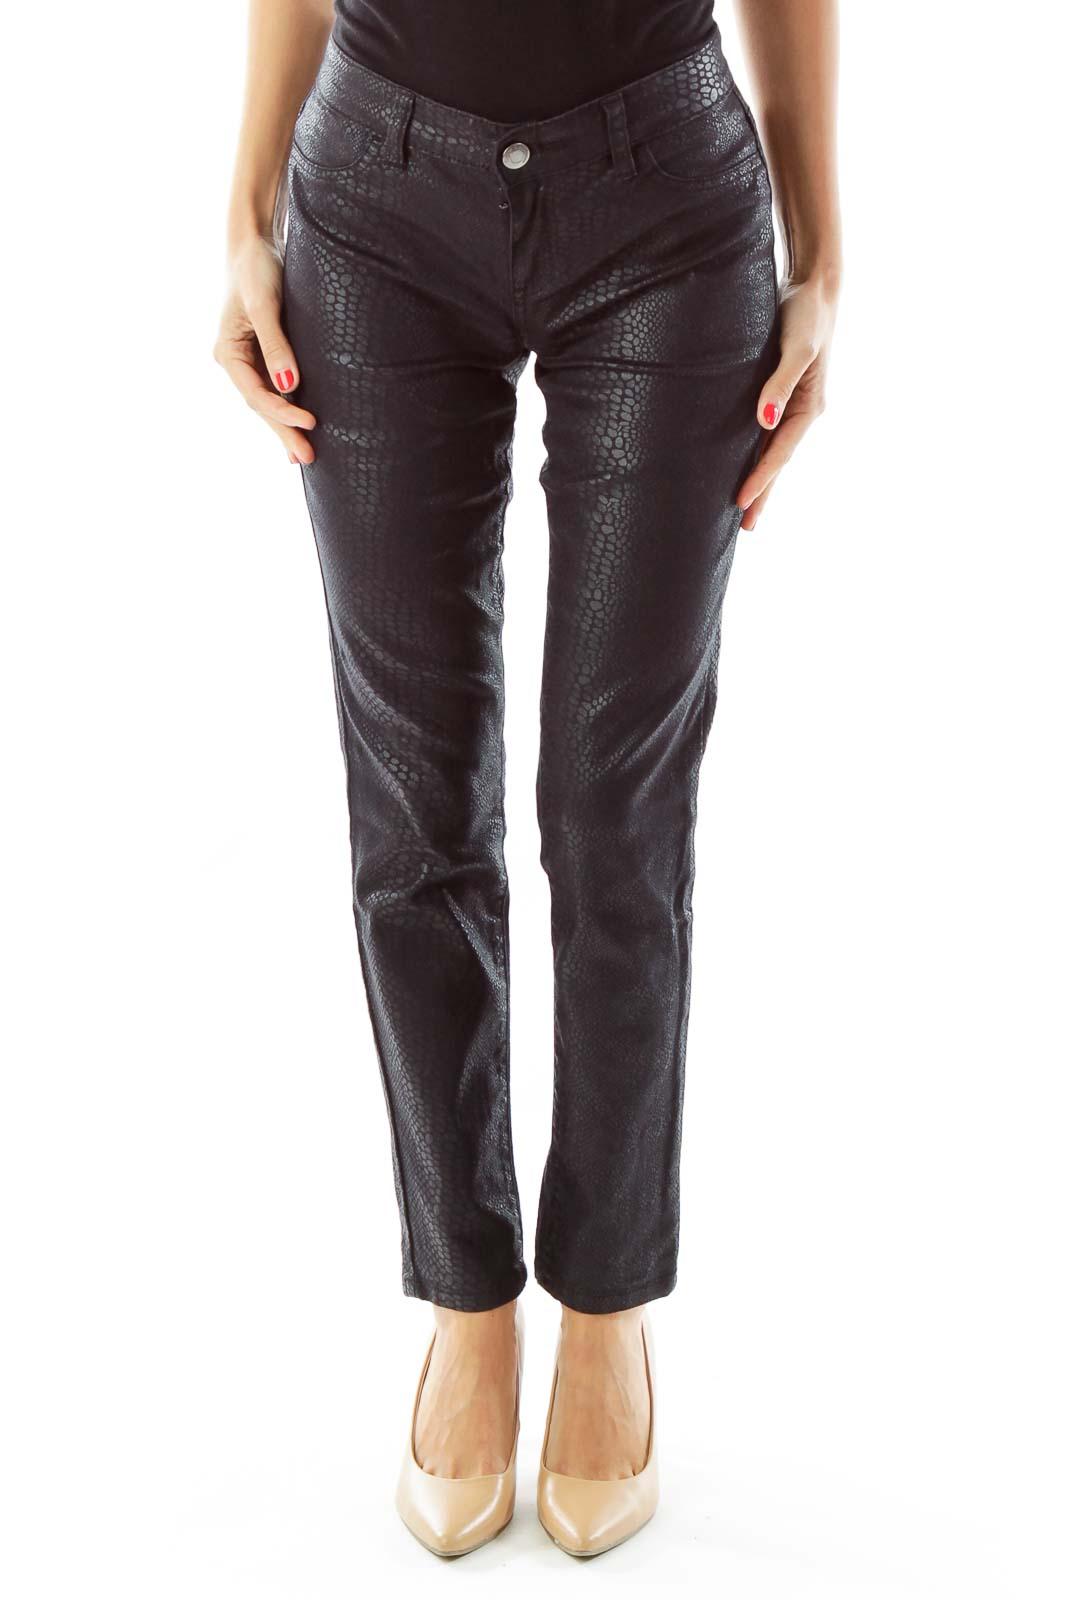 Black Alligator Print Slim Fit Jeans